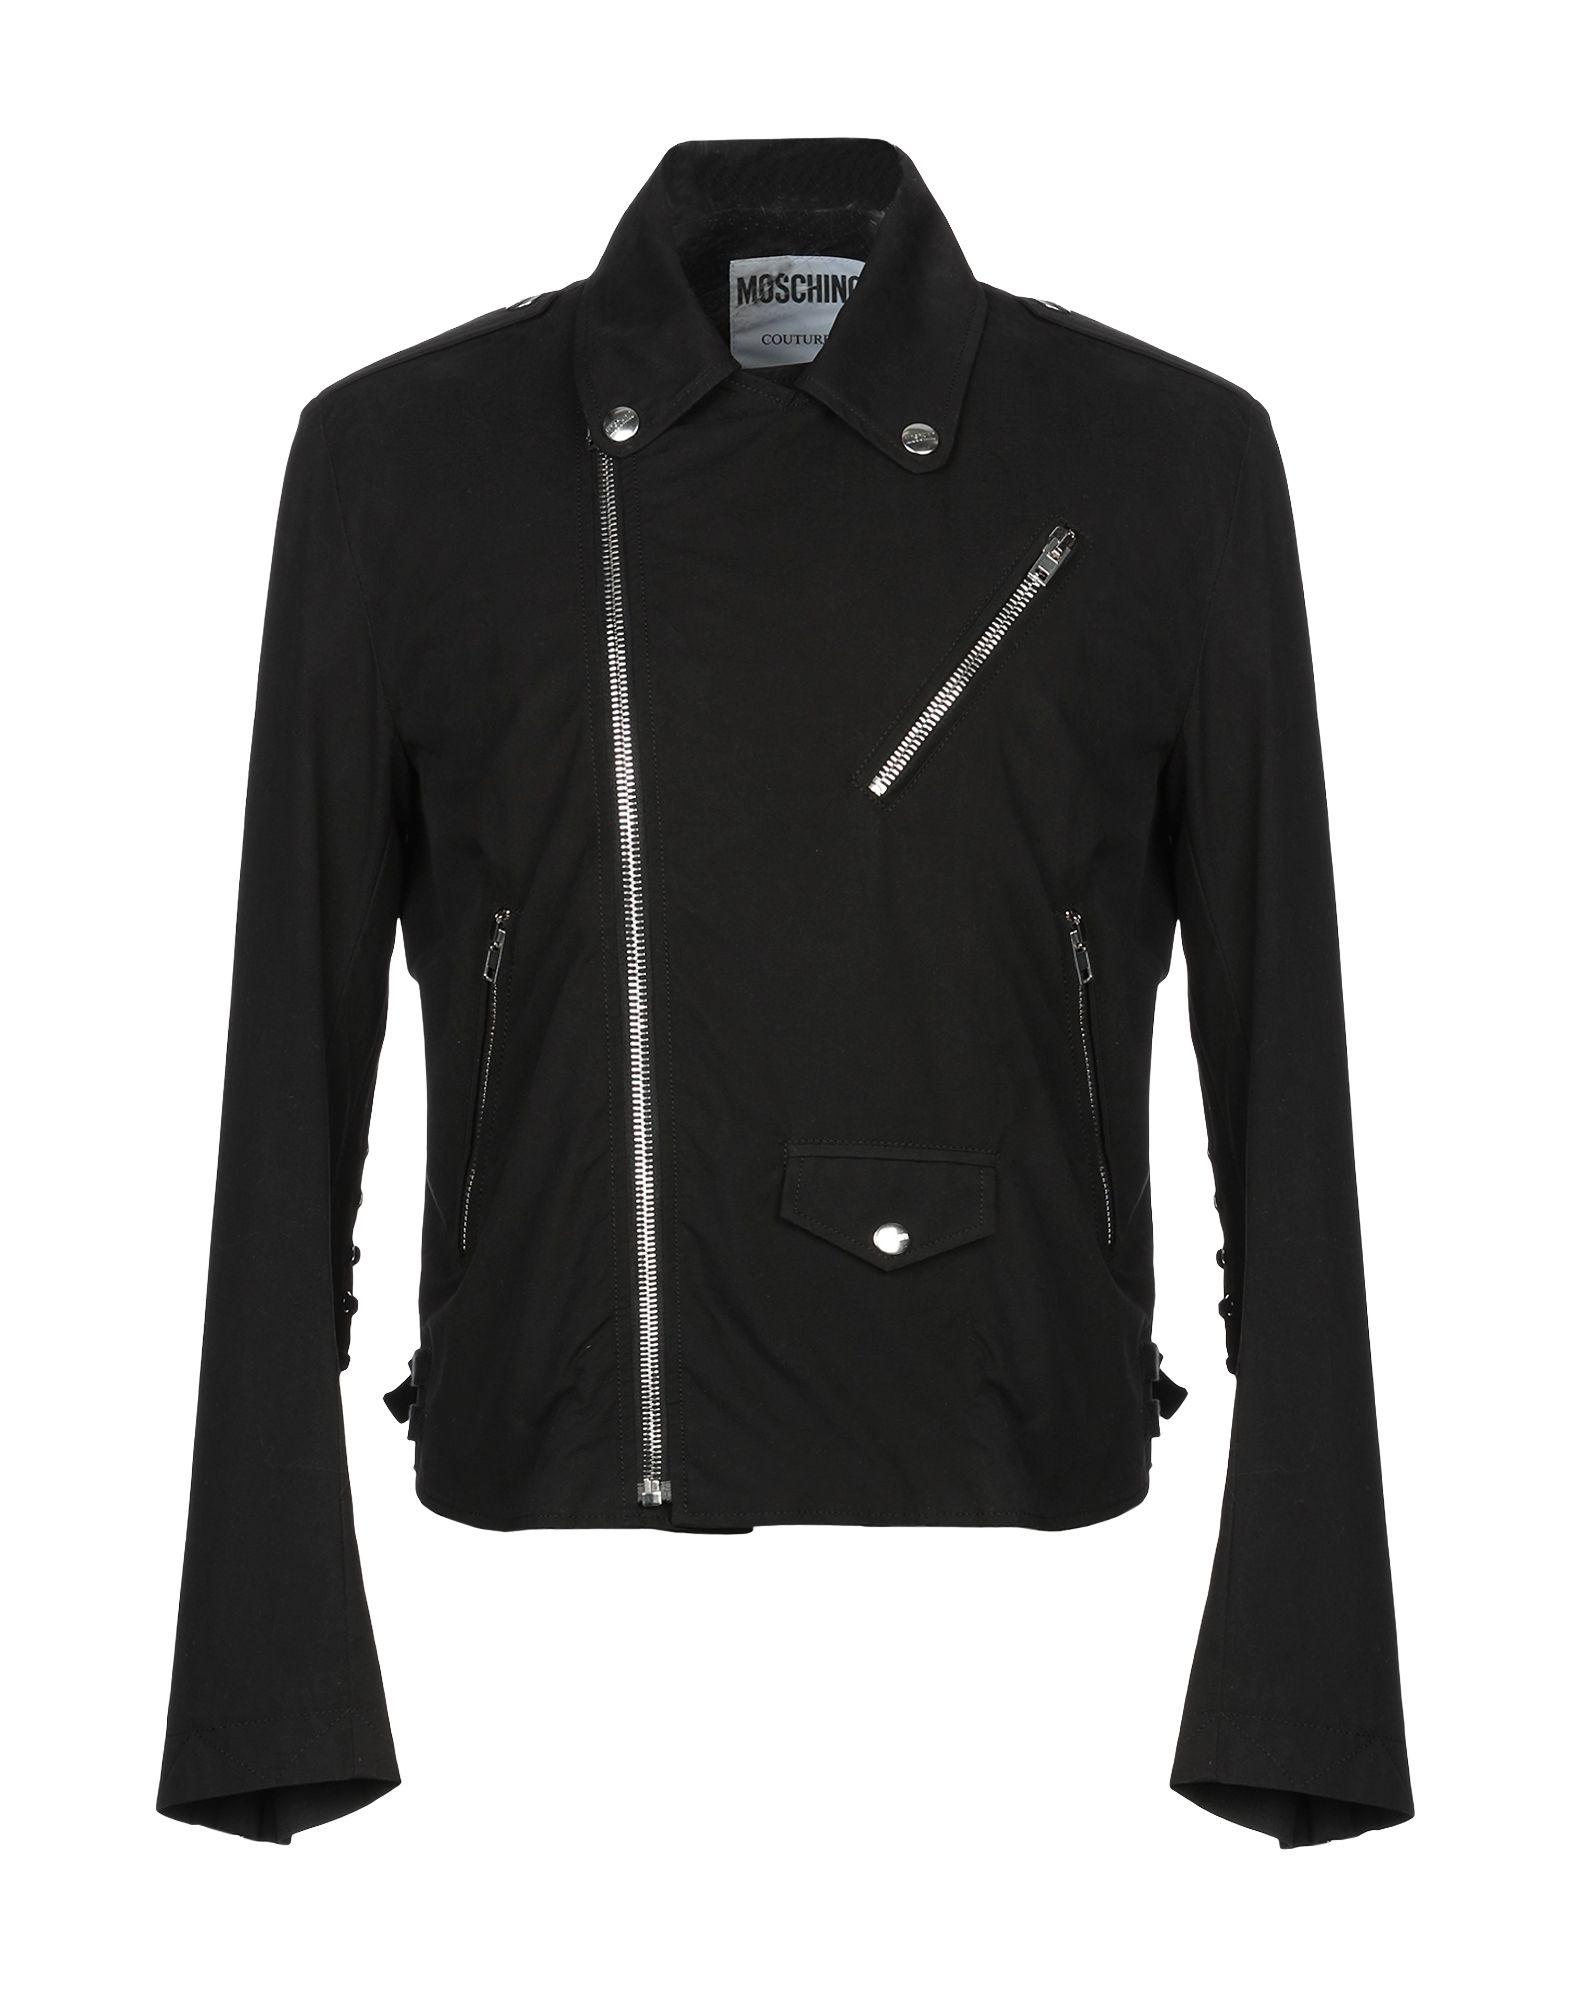 MOSCHINO Куртка двуцетная кожаная куртка косуха на молнии